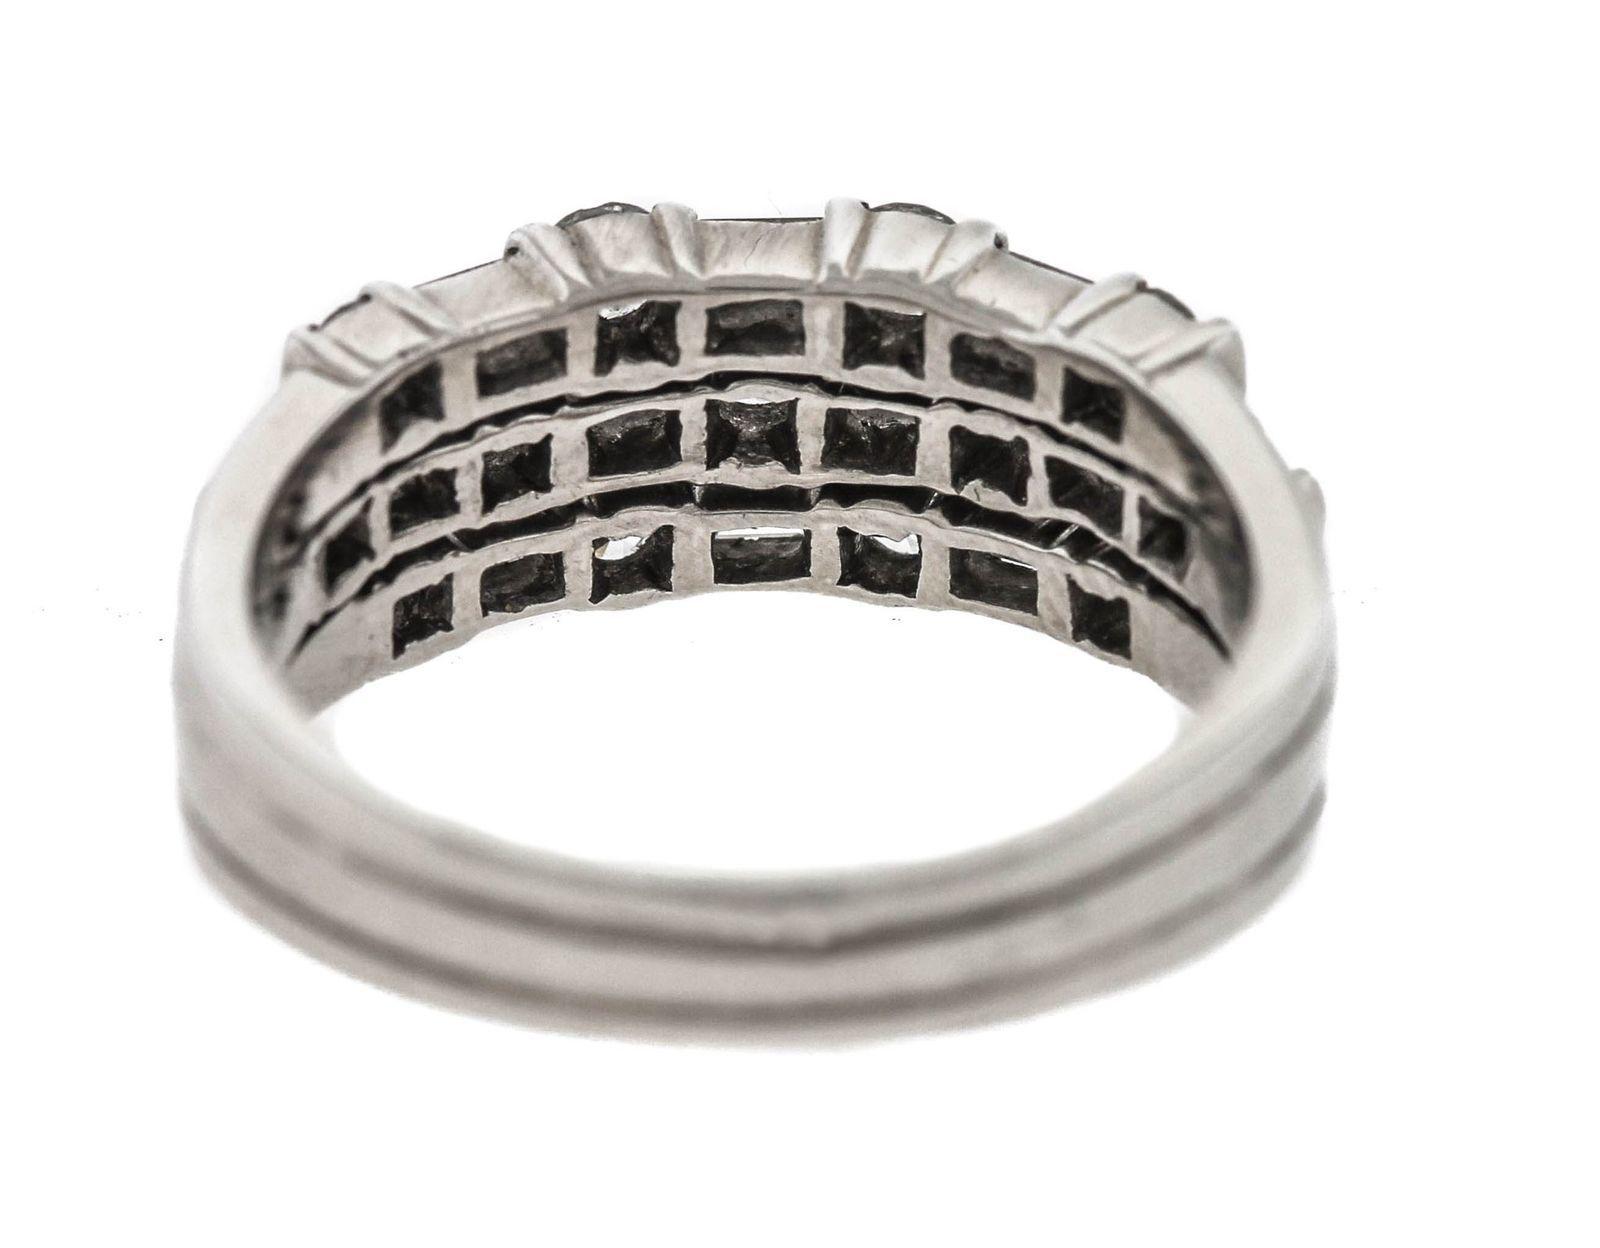 b71ca548d Ladies Genuine Tiffany & Co. 950 Platinum 3 Row 0.79ctw Diamond Engagement  Ring